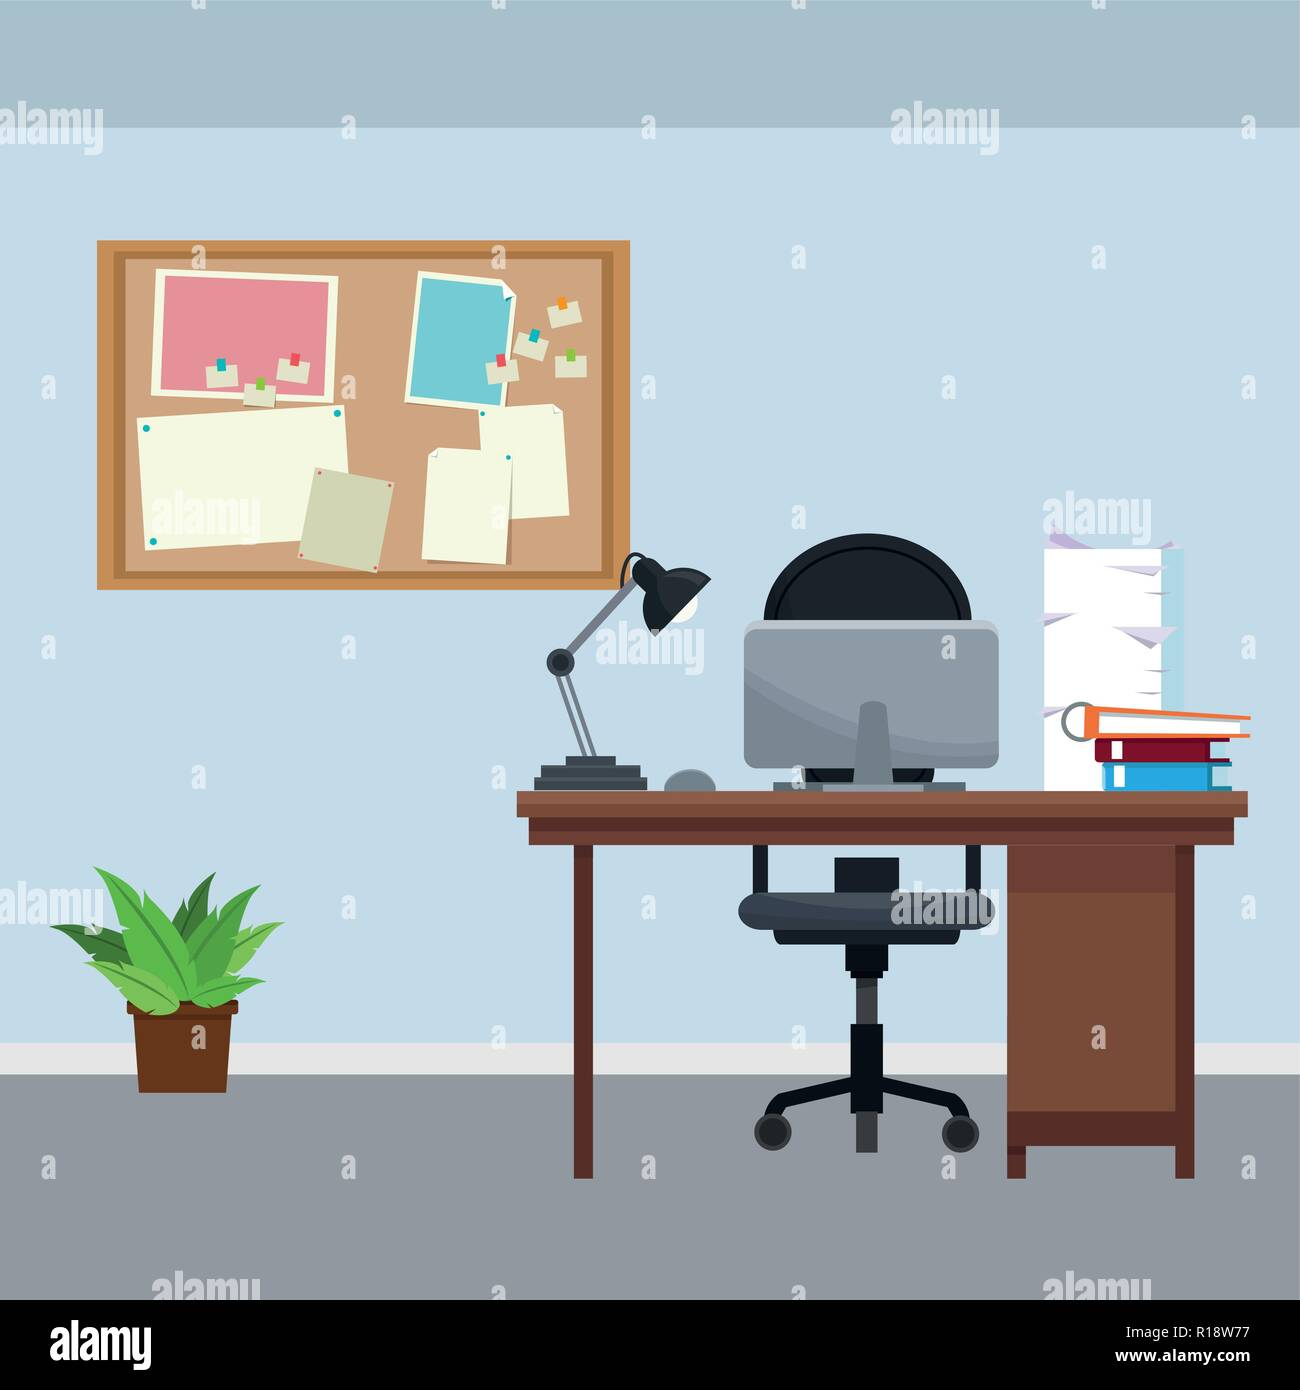 Office Work Place Cartoon Vector Illustration Graphic Design Stock